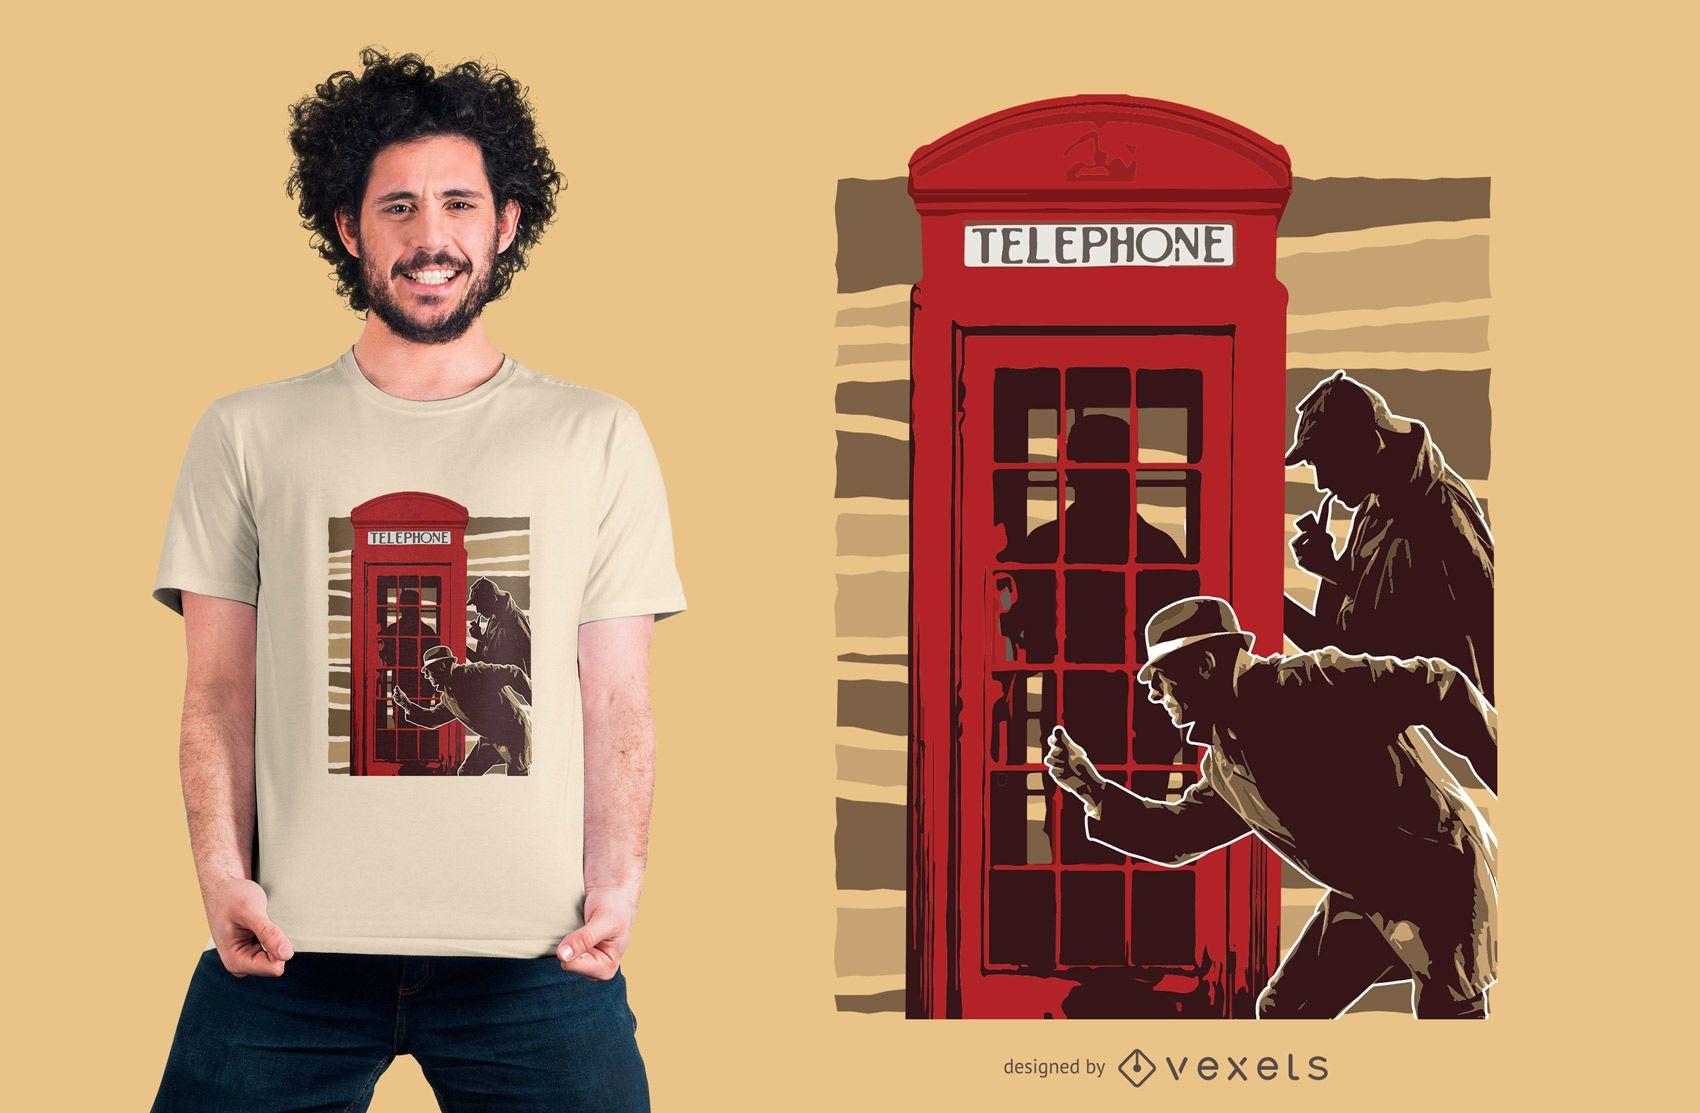 Detectives telephone t-shirt design